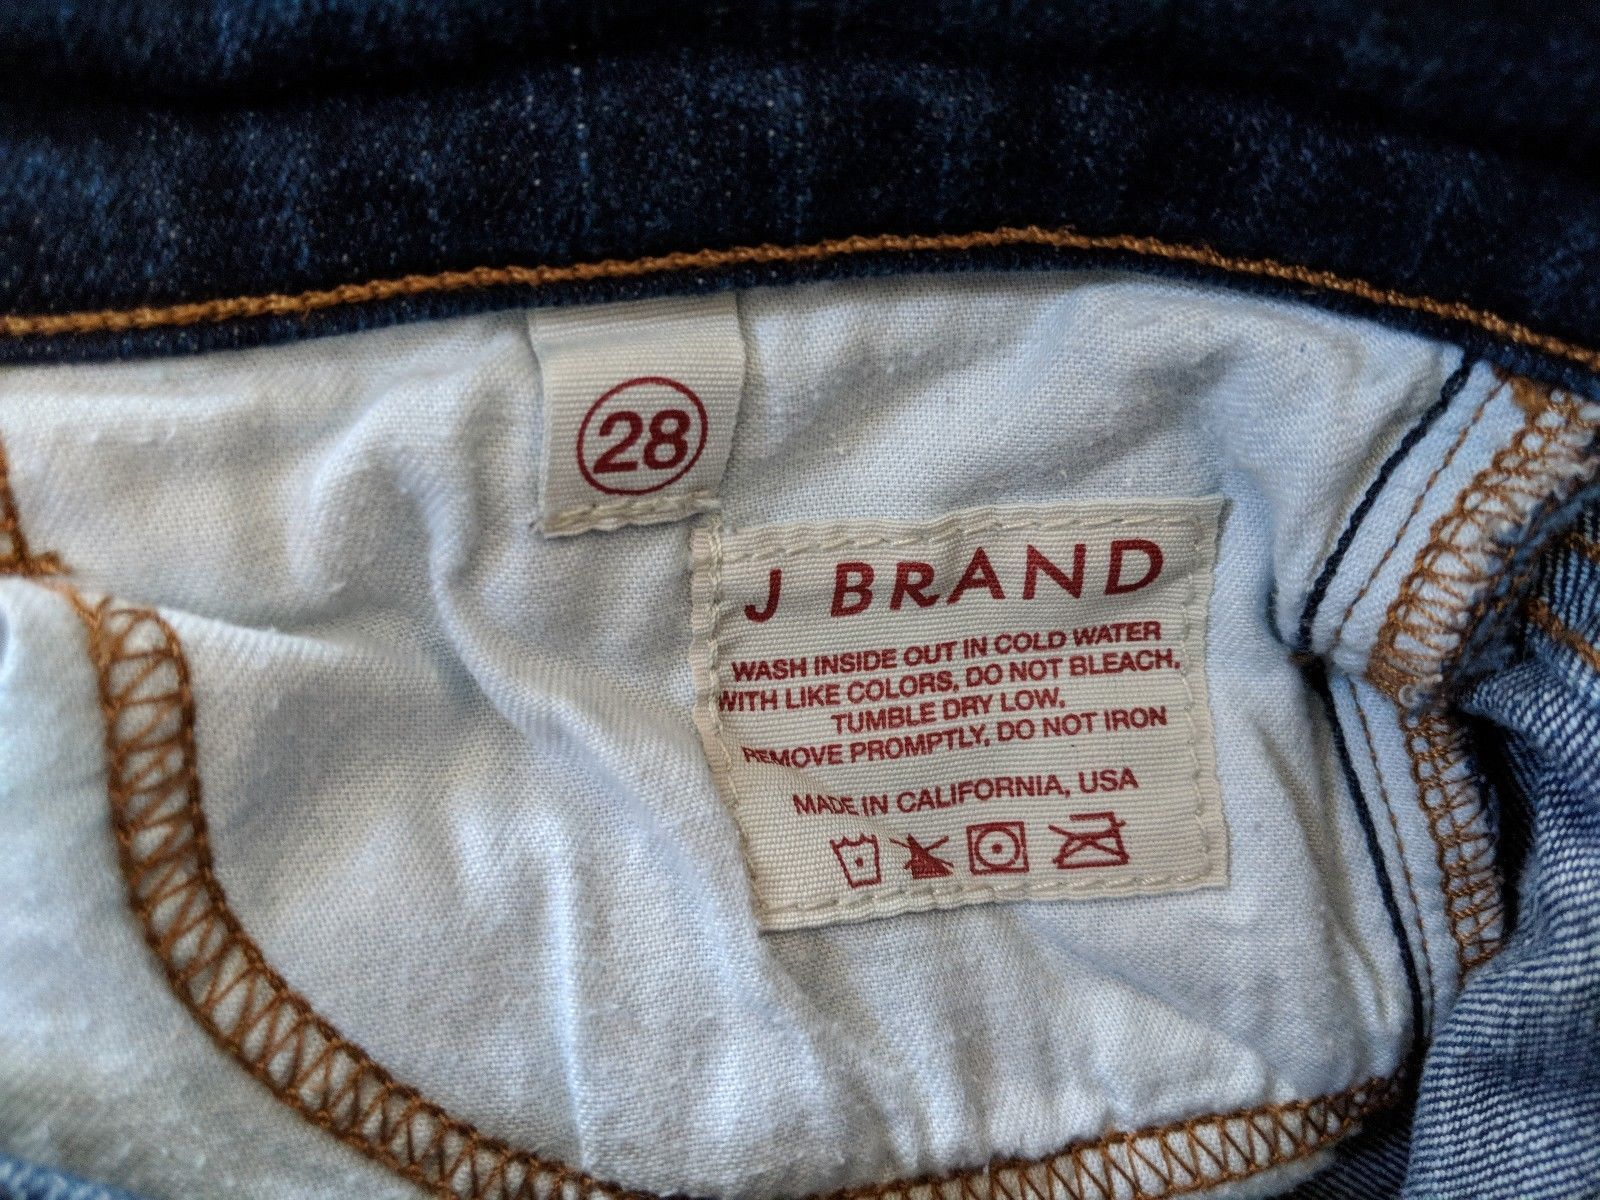 J Brand 28 Aruba Denim Skinny Slim Stretch Medium Wash Jeans Womens Pants image 6